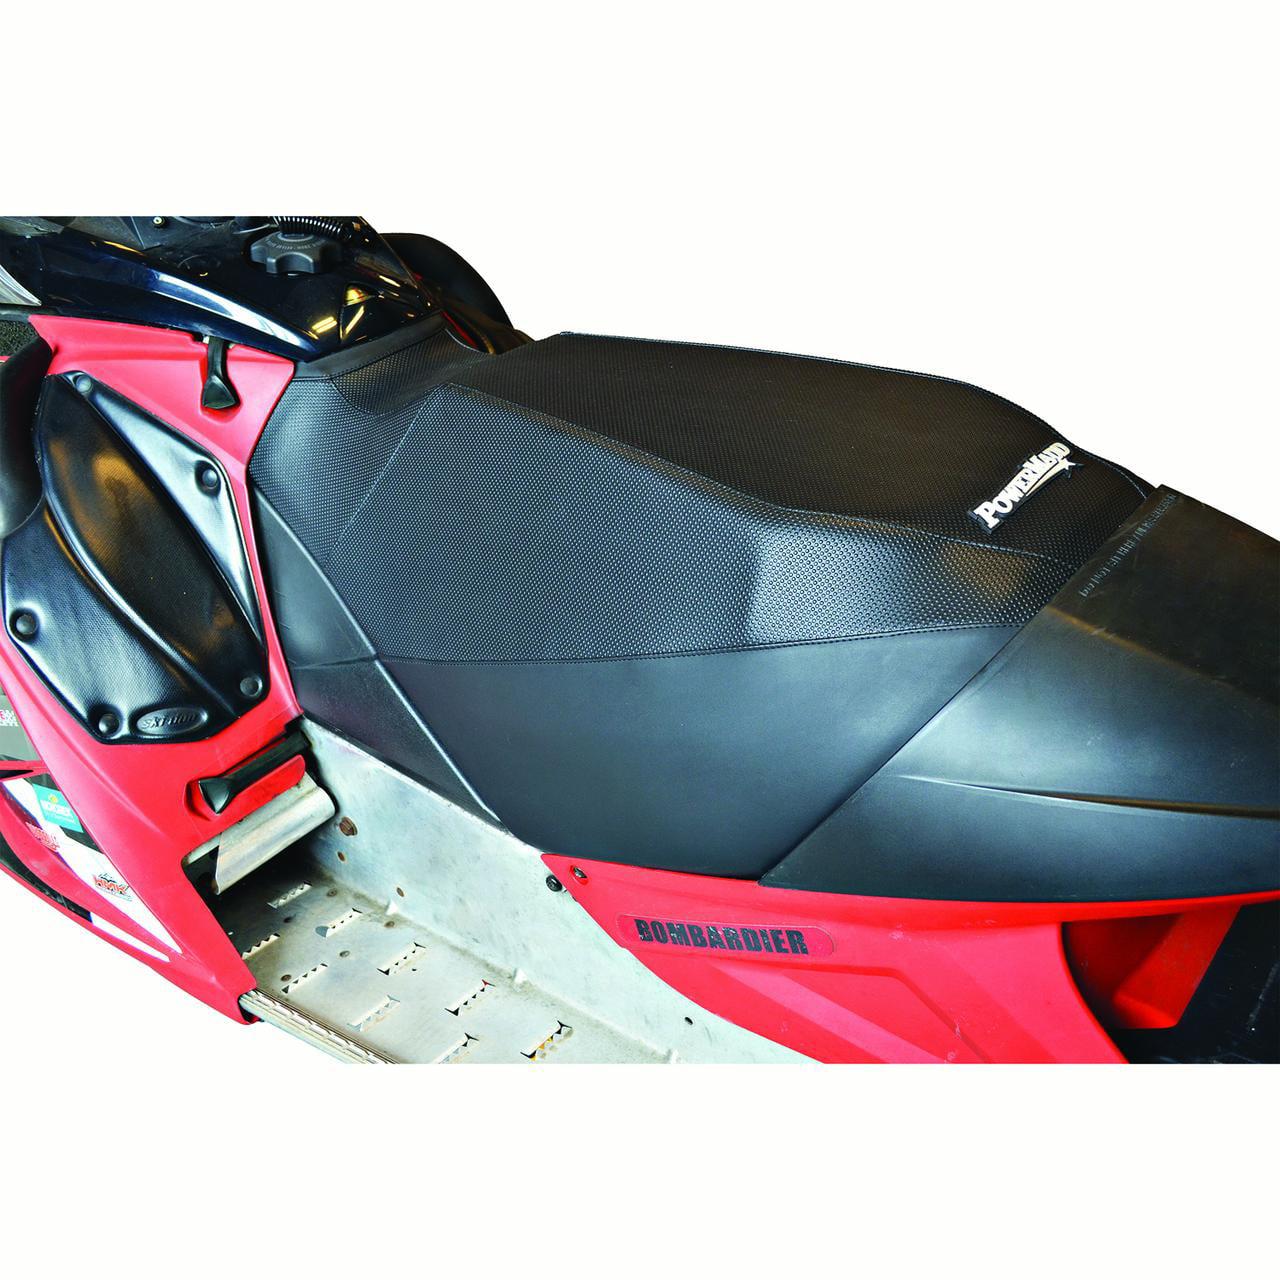 POWERMADD Ski-doo Seat Cover by Powermadd